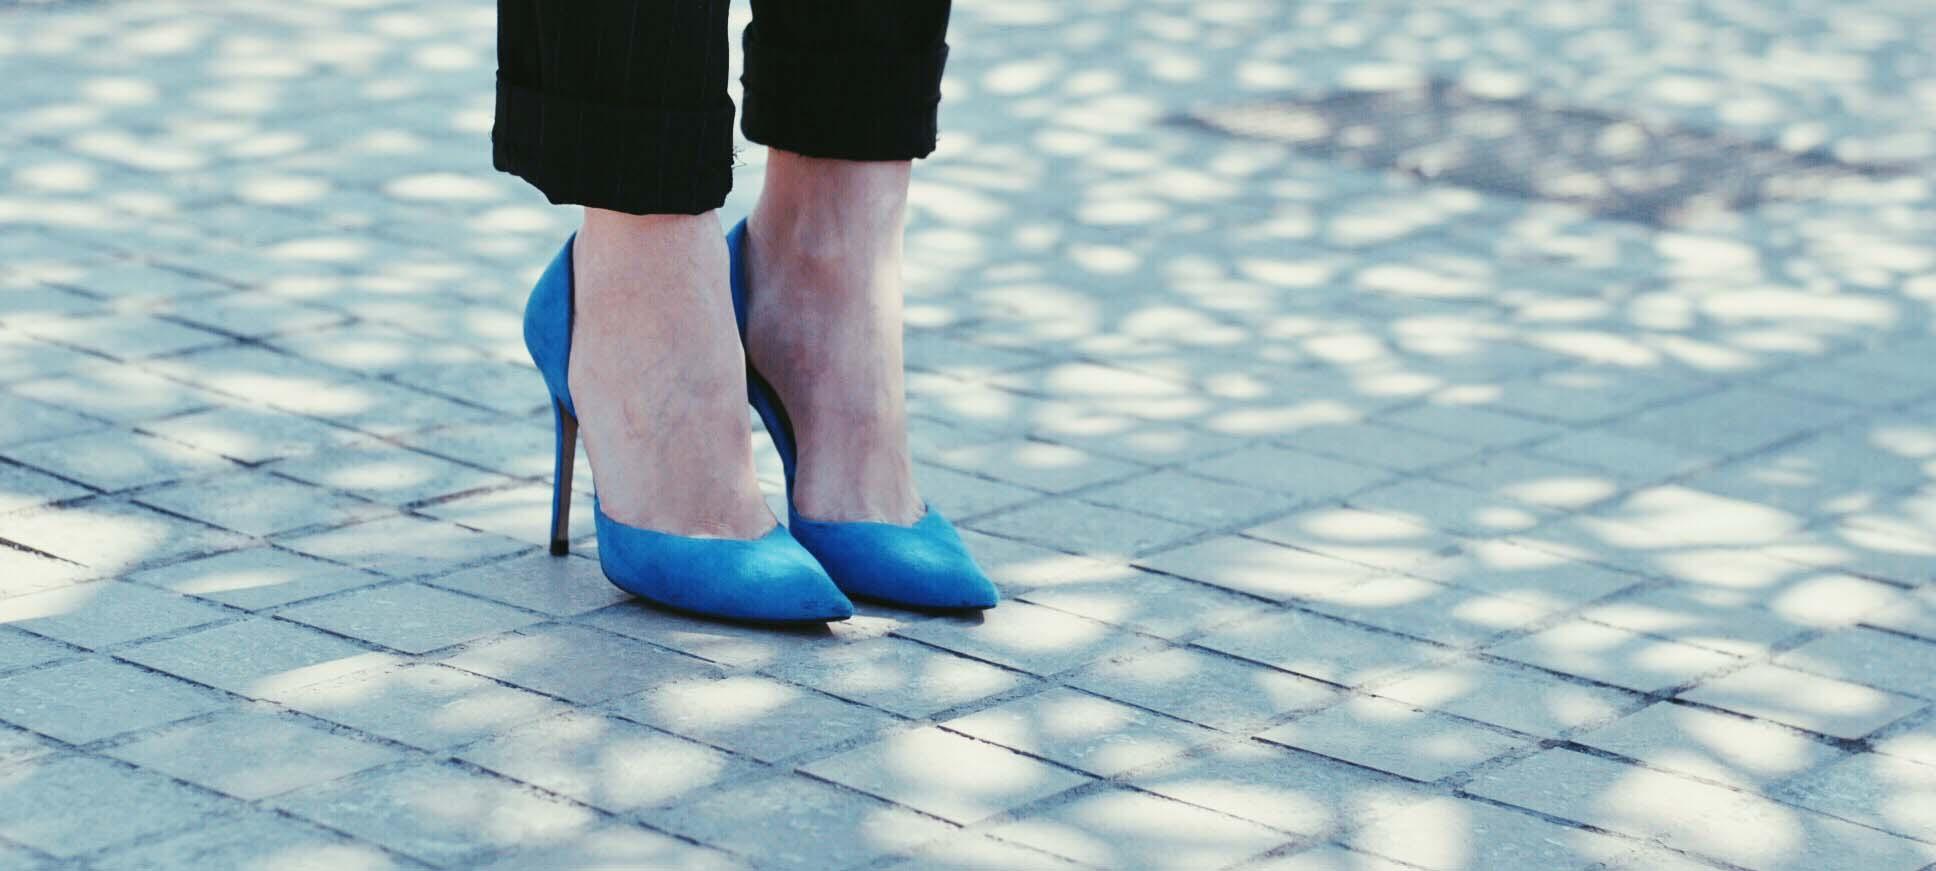 talons bleus